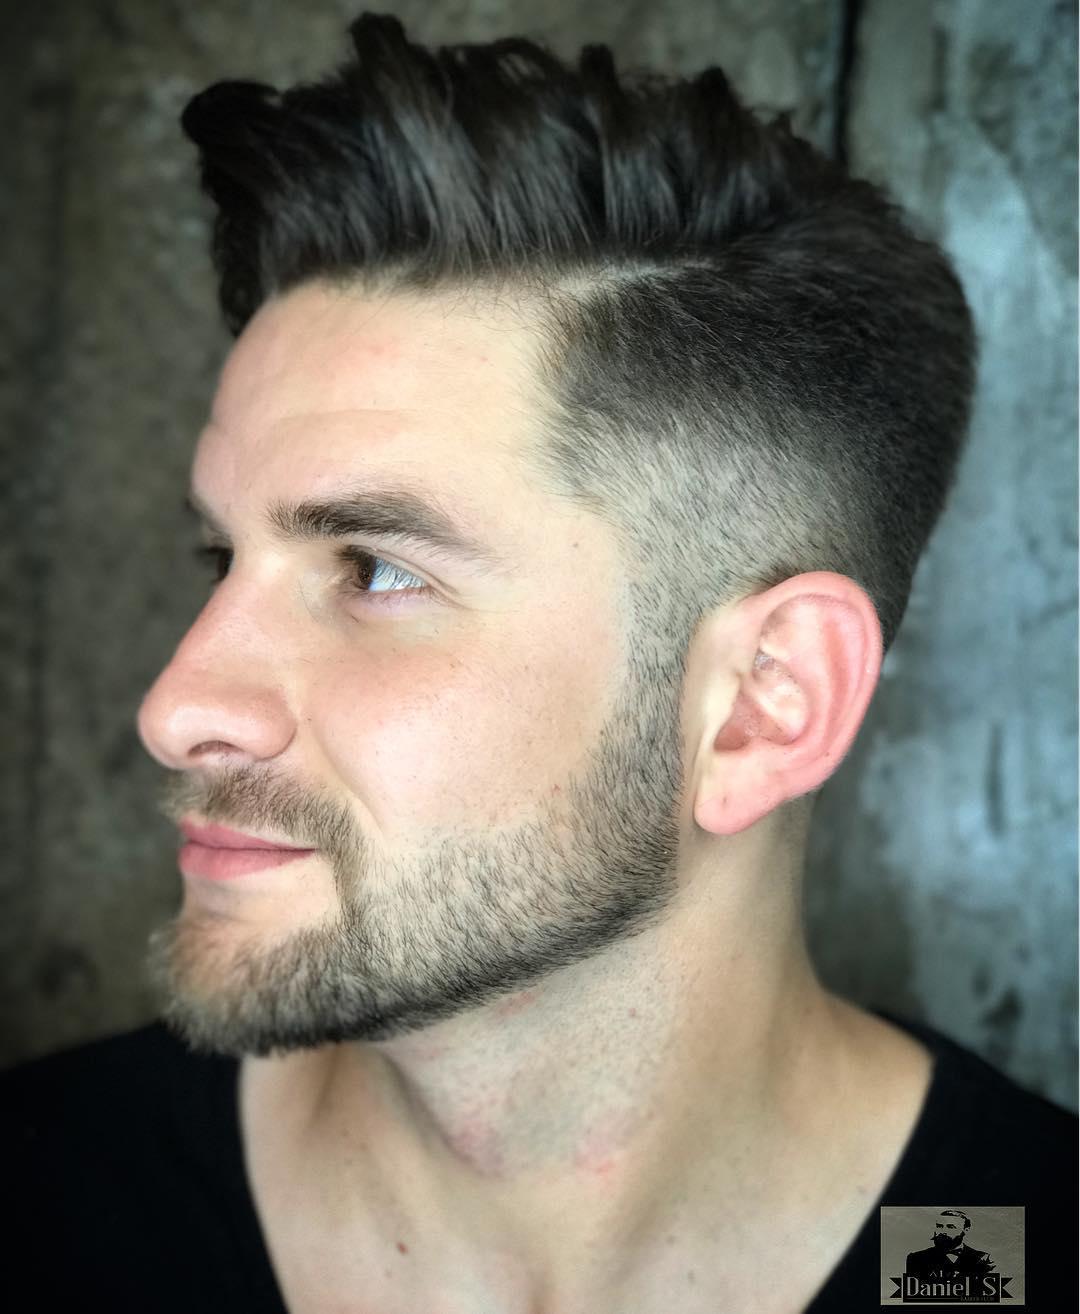 20 best mediumlength hairstyles for men in 2018  men's